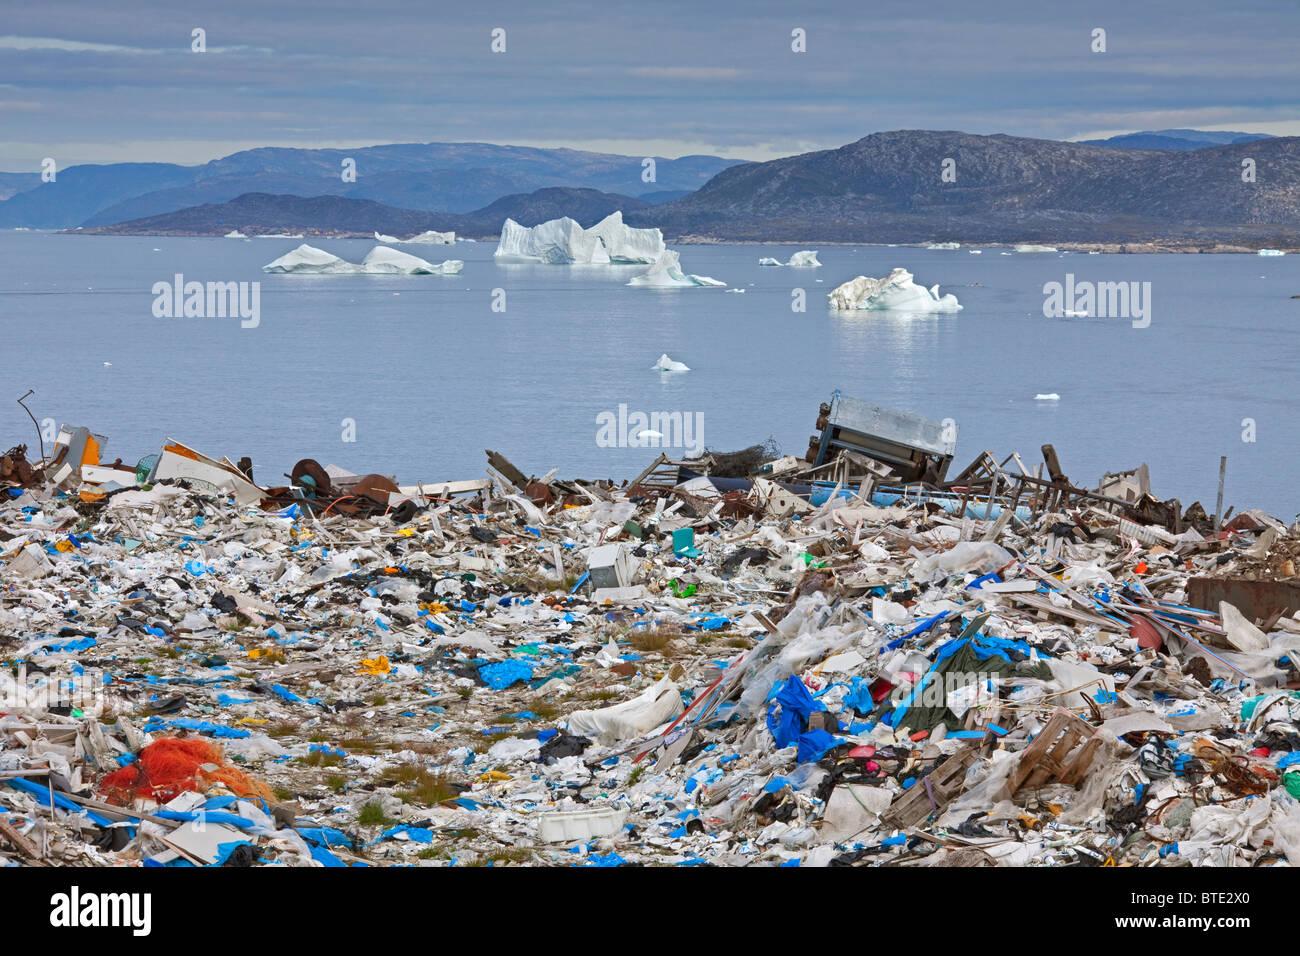 Rubbish at garbage dump and icebergs at Ilulissat / Jakobshavn, Disko-Bay, Greenland - Stock Image